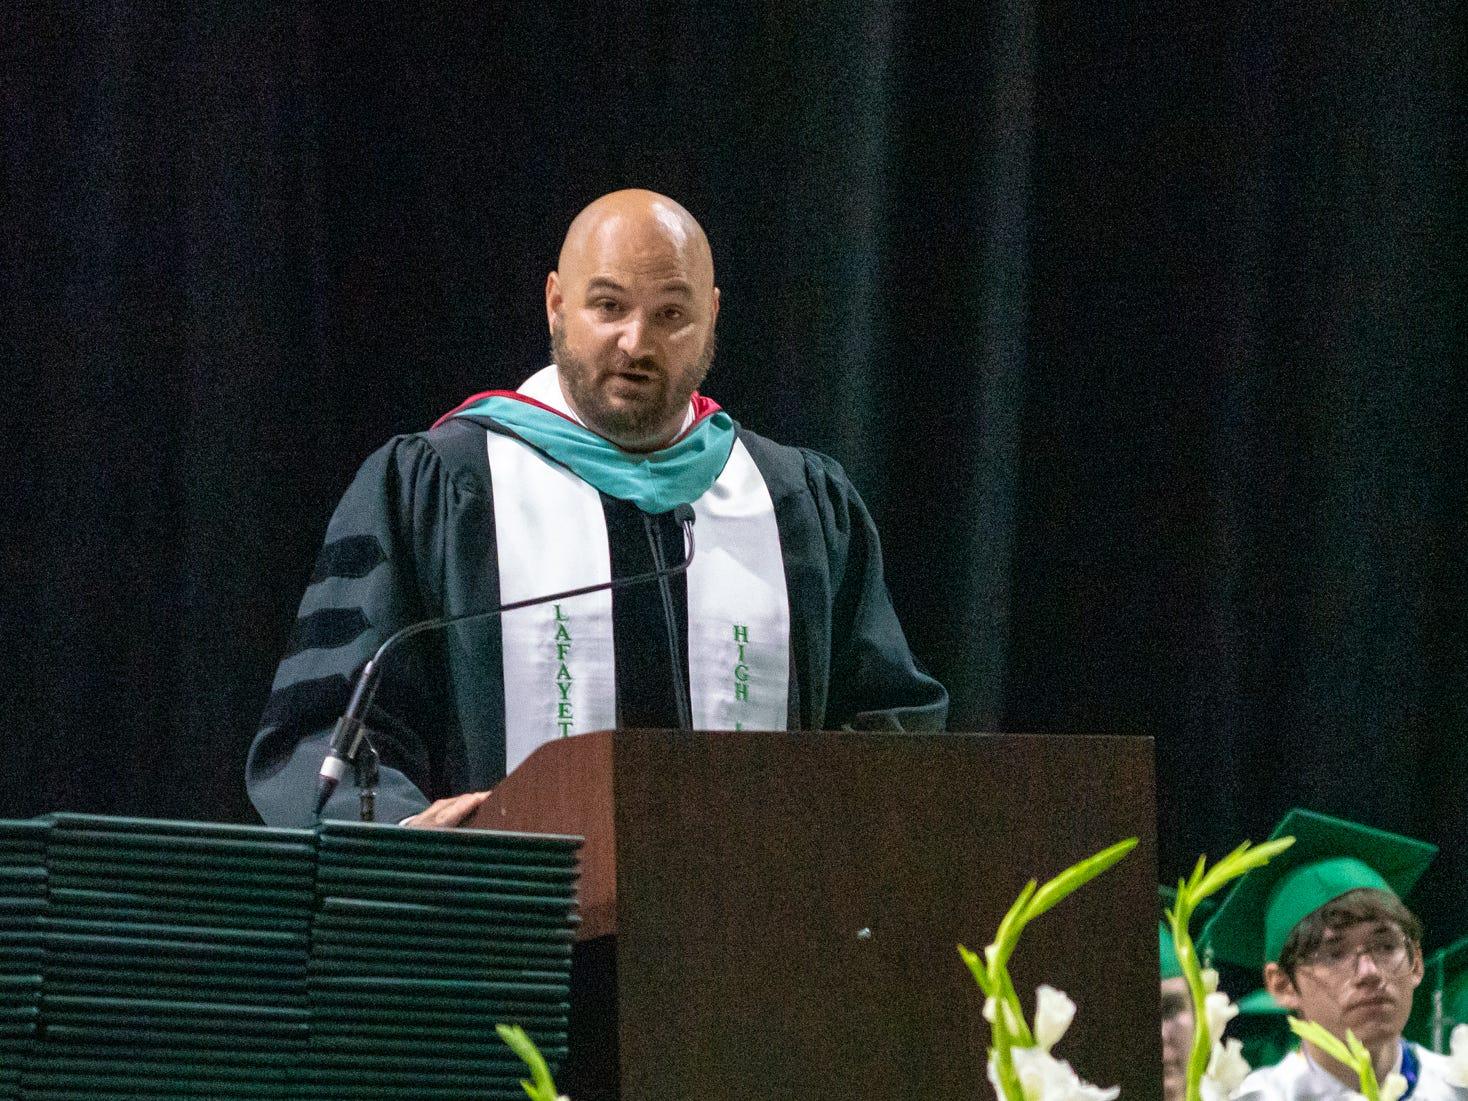 Lafayette High school's principal Dr. Donald Thornton speaks to the graduating seniors as Lafayette High School holds its graduation ceremony at the Cajundome on Saturday, May 11, 2019.